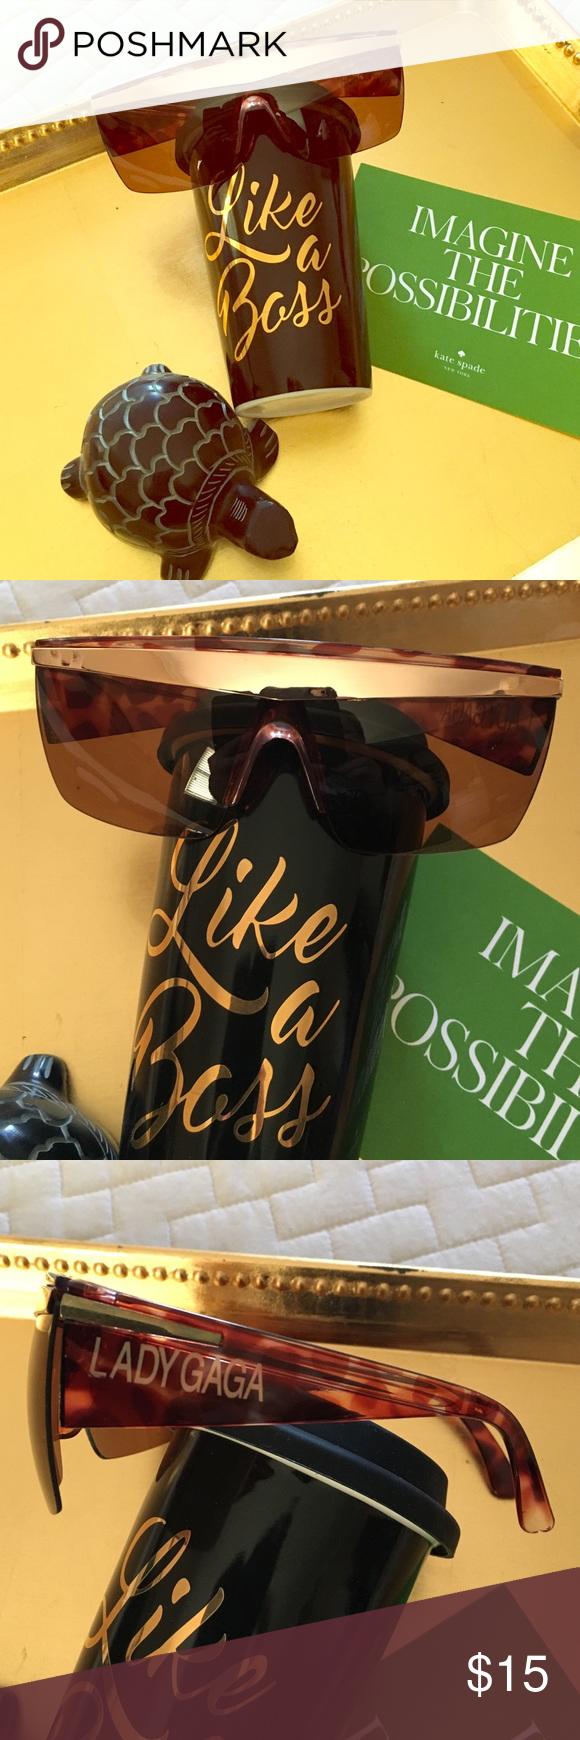 Lady Gaga Sunglasses My Posh Picks Pinterest Lady Gaga Vip